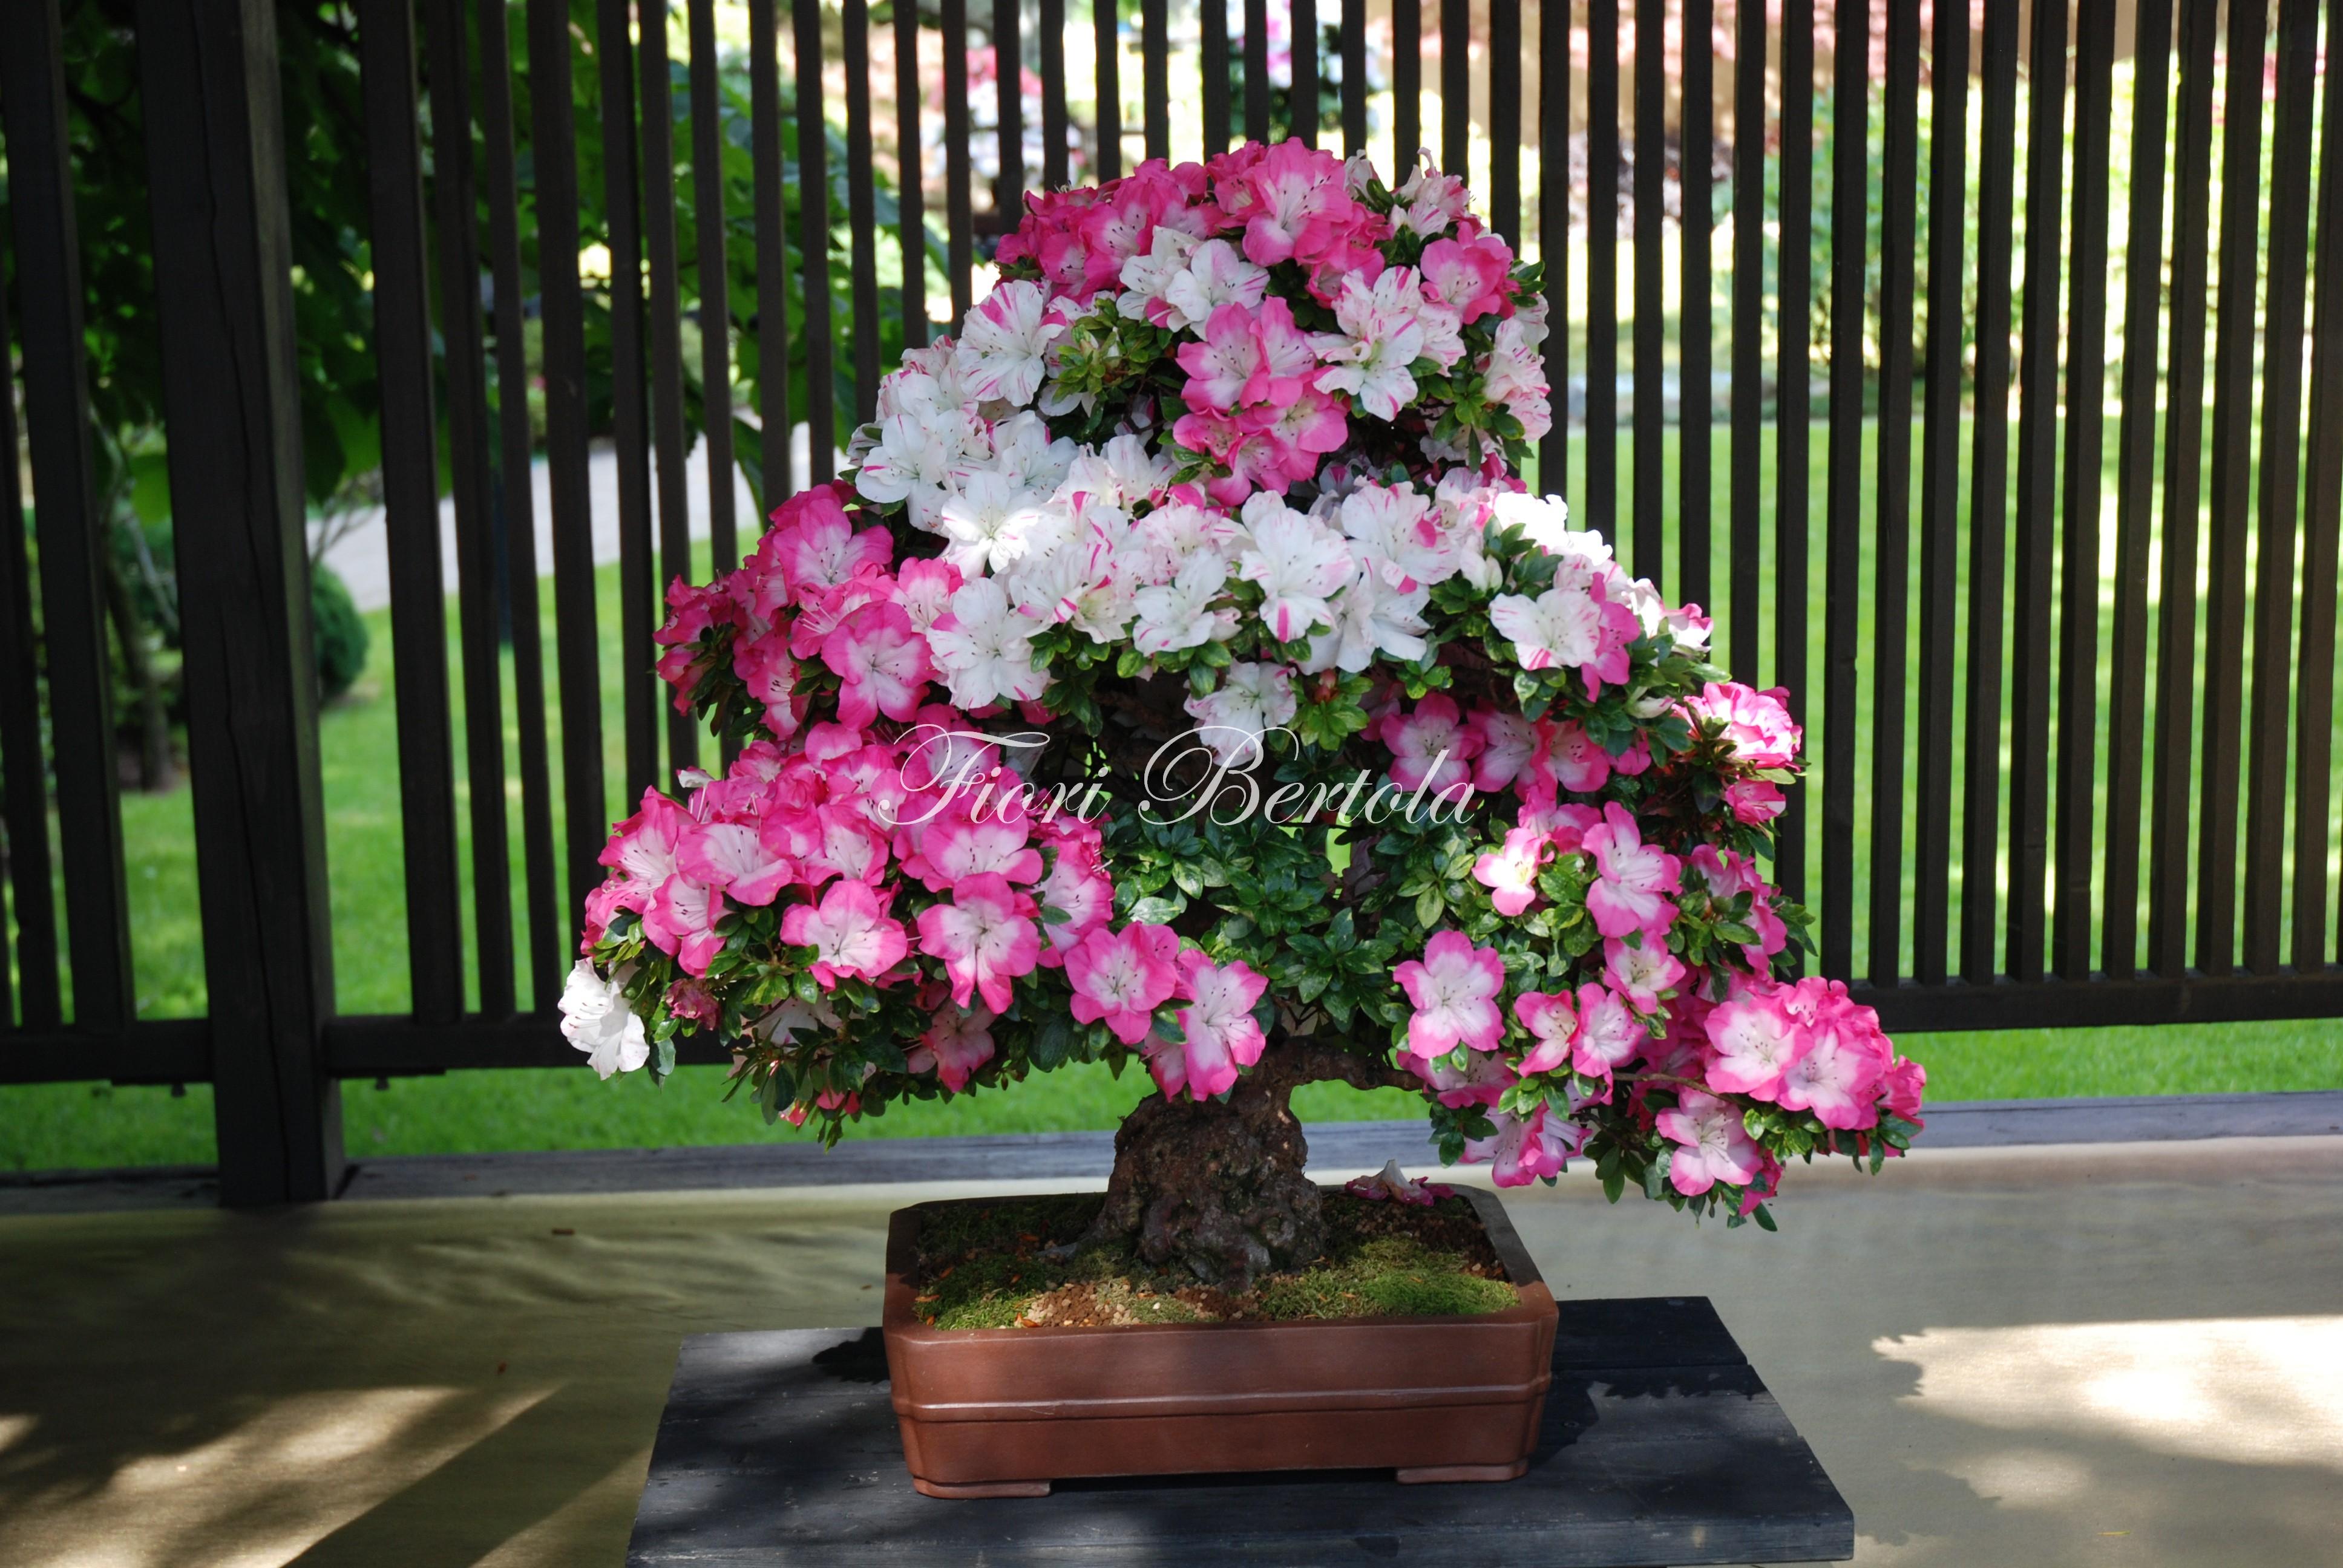 Fiori Bertola centro bonsai Mortara